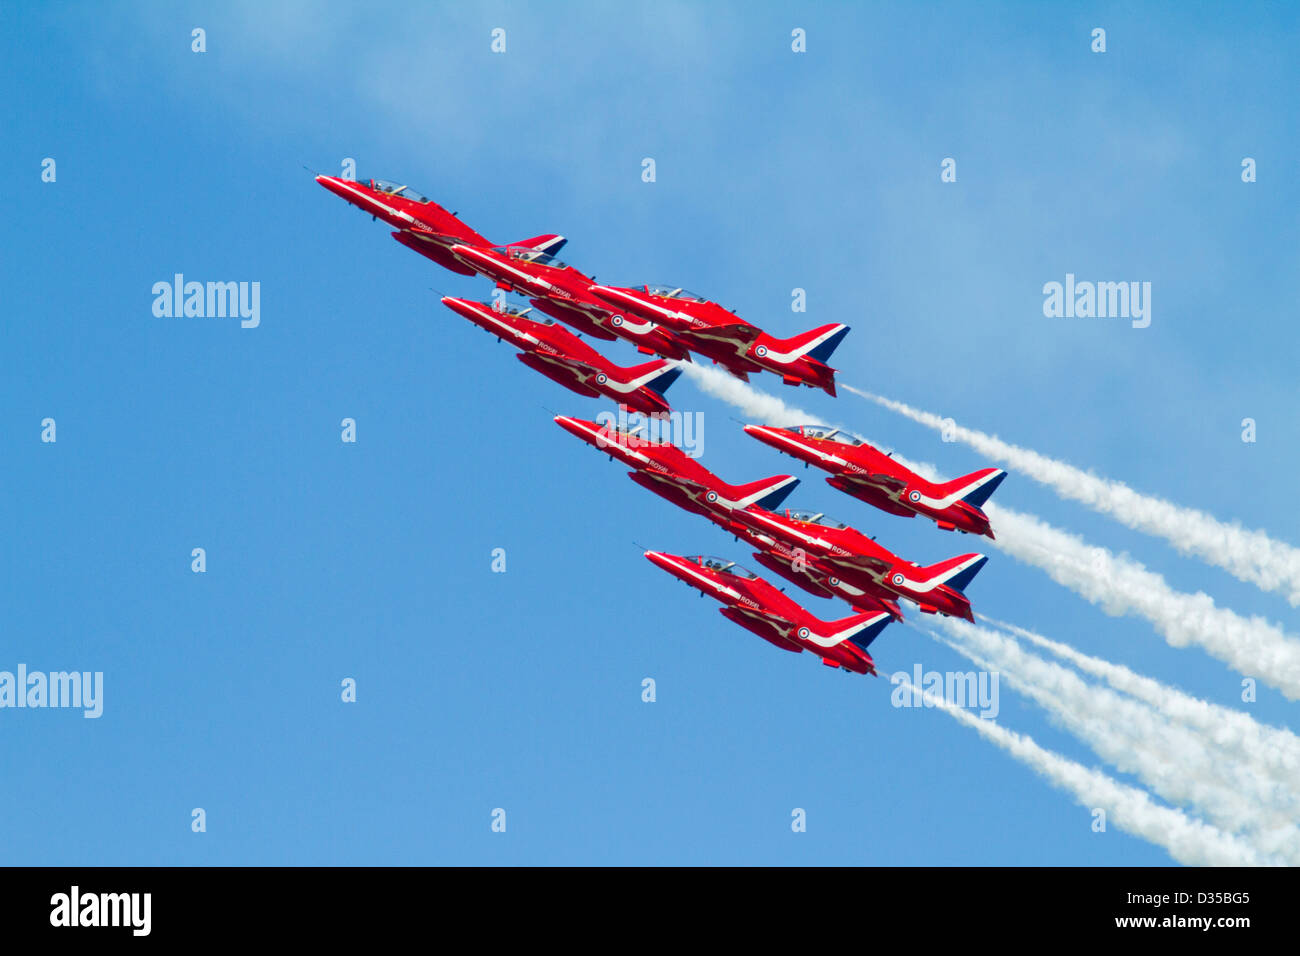 Red Arrows Aerobatic Team in flight - Stock Image